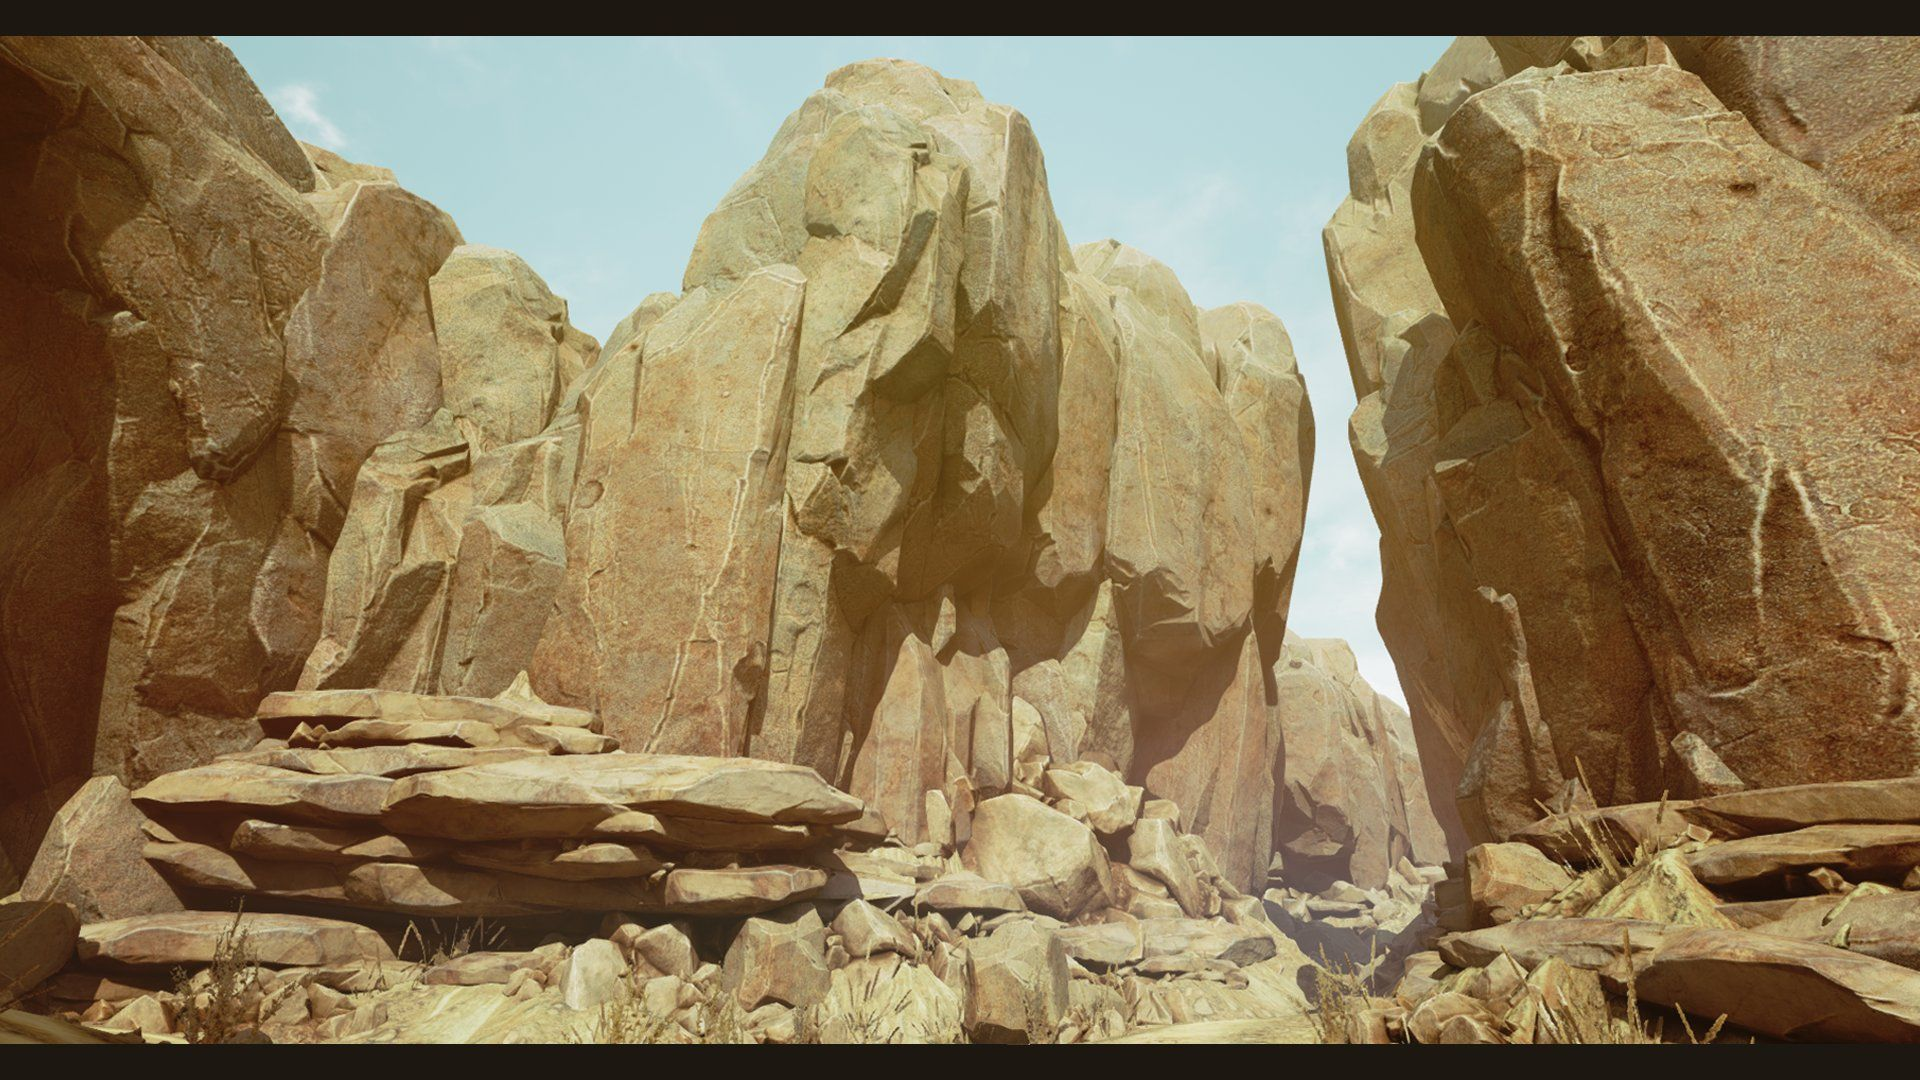 ArtStation - [UE4] Arid Desert Environment , Tris Baybayan